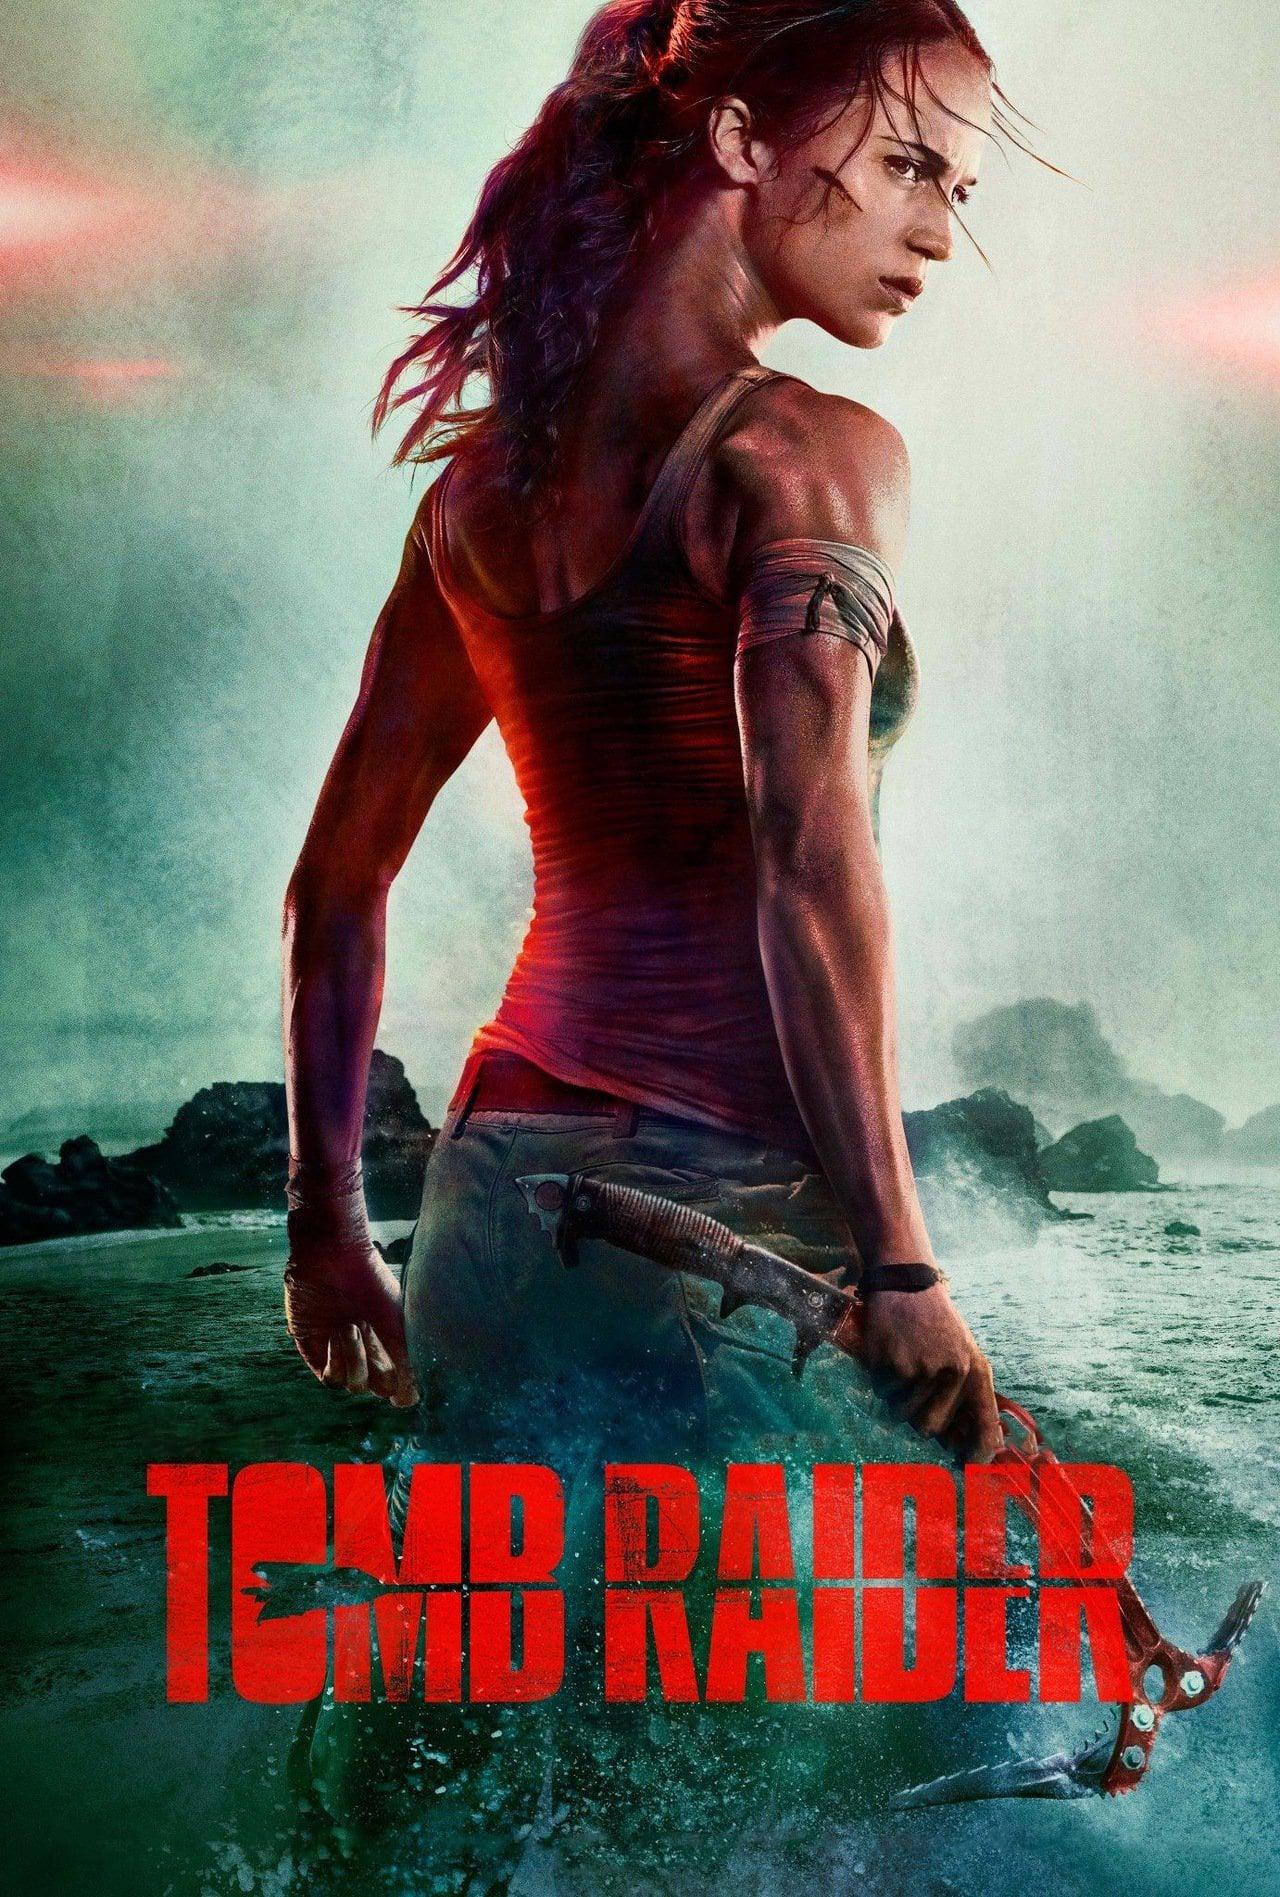 Tomb-Raider-2018 دانلود فیلم Tomb Raider 2018